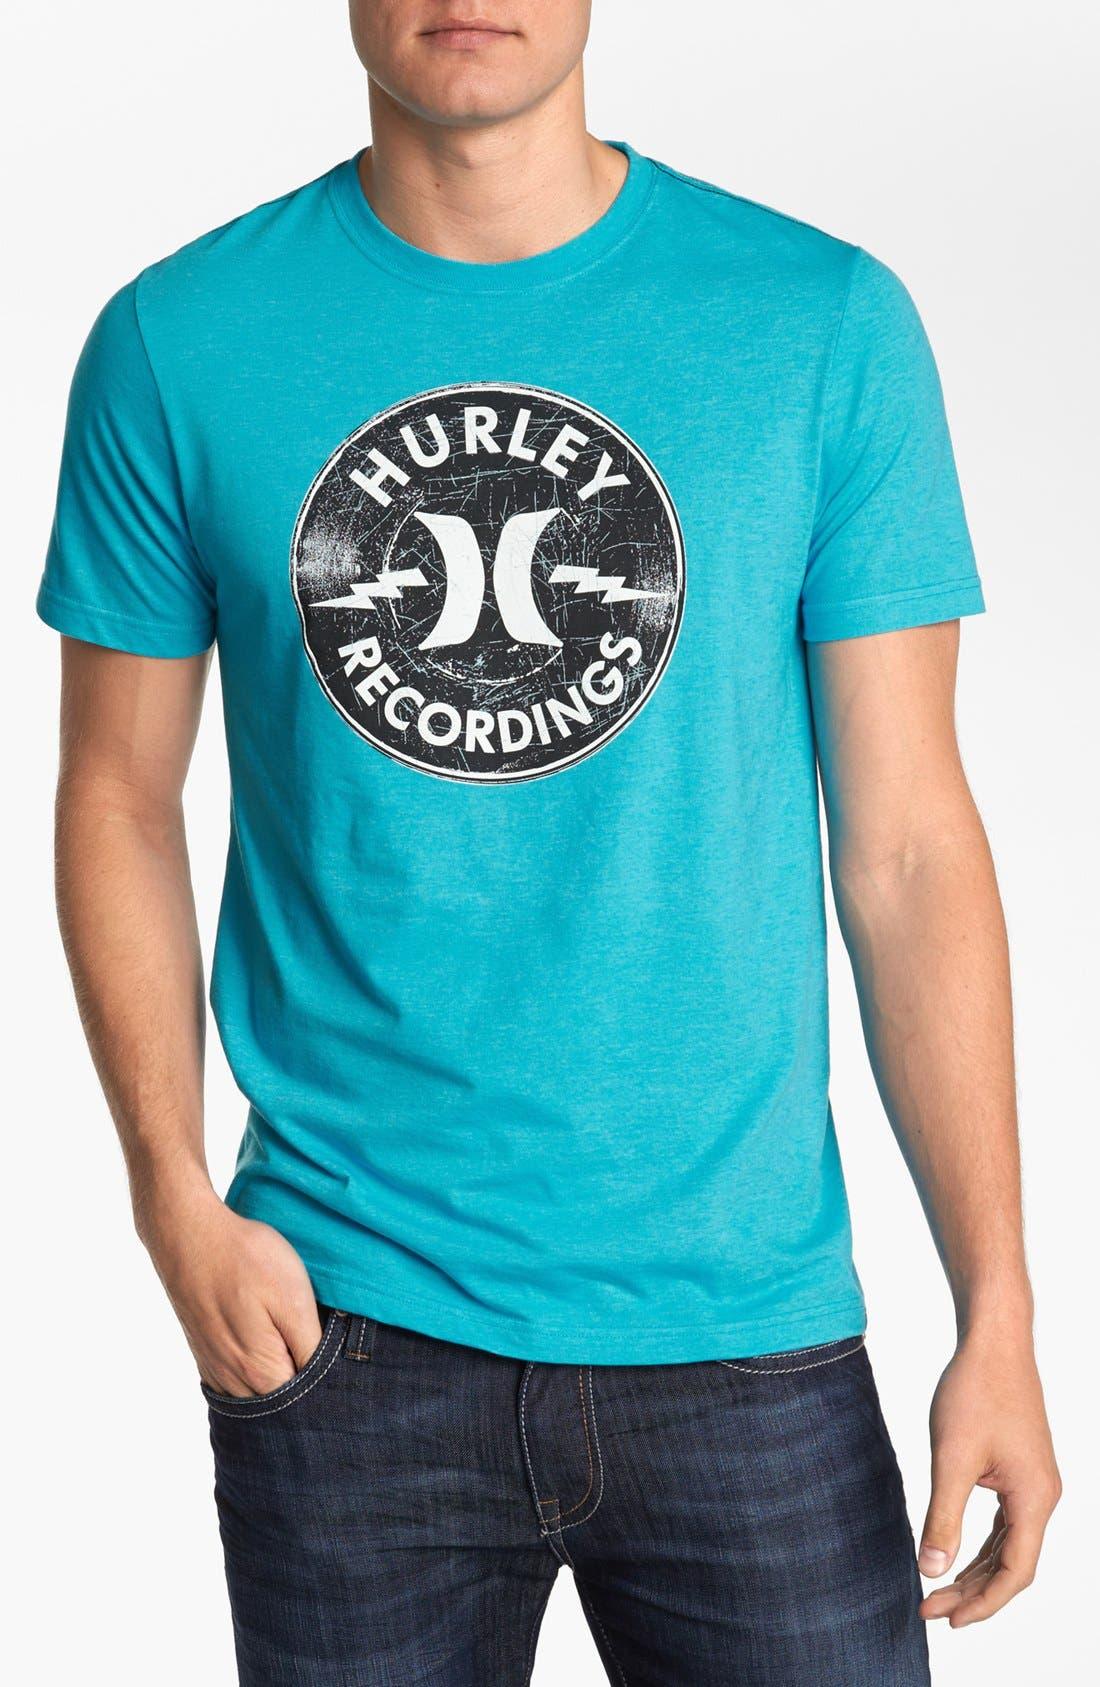 Alternate Image 1 Selected - Hurley 'Recordings' T-Shirt